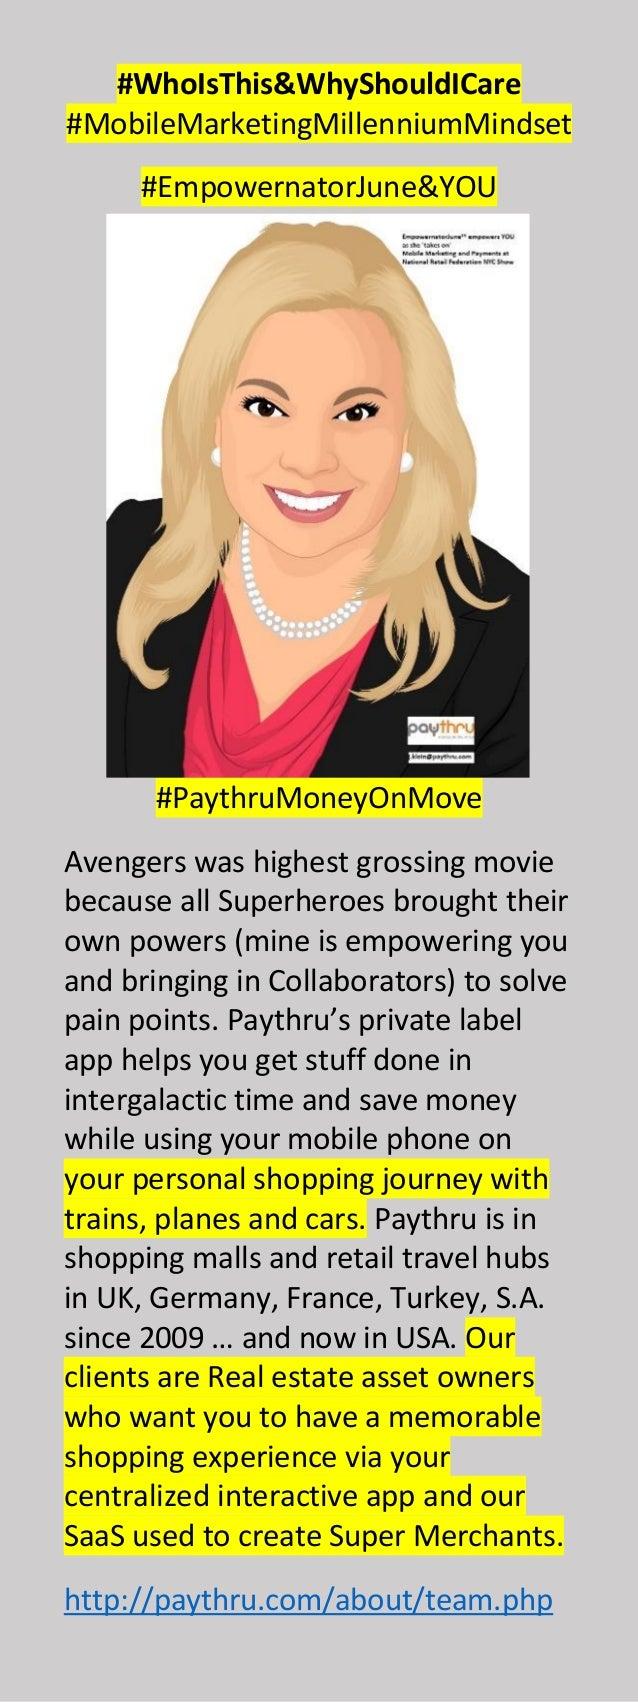 #WhoIsThis&WhyShouldICare #MobileMarketingMillenniumMindset #EmpowernatorJune&YOU #PaythruMoneyOnMove Avengers was highest...